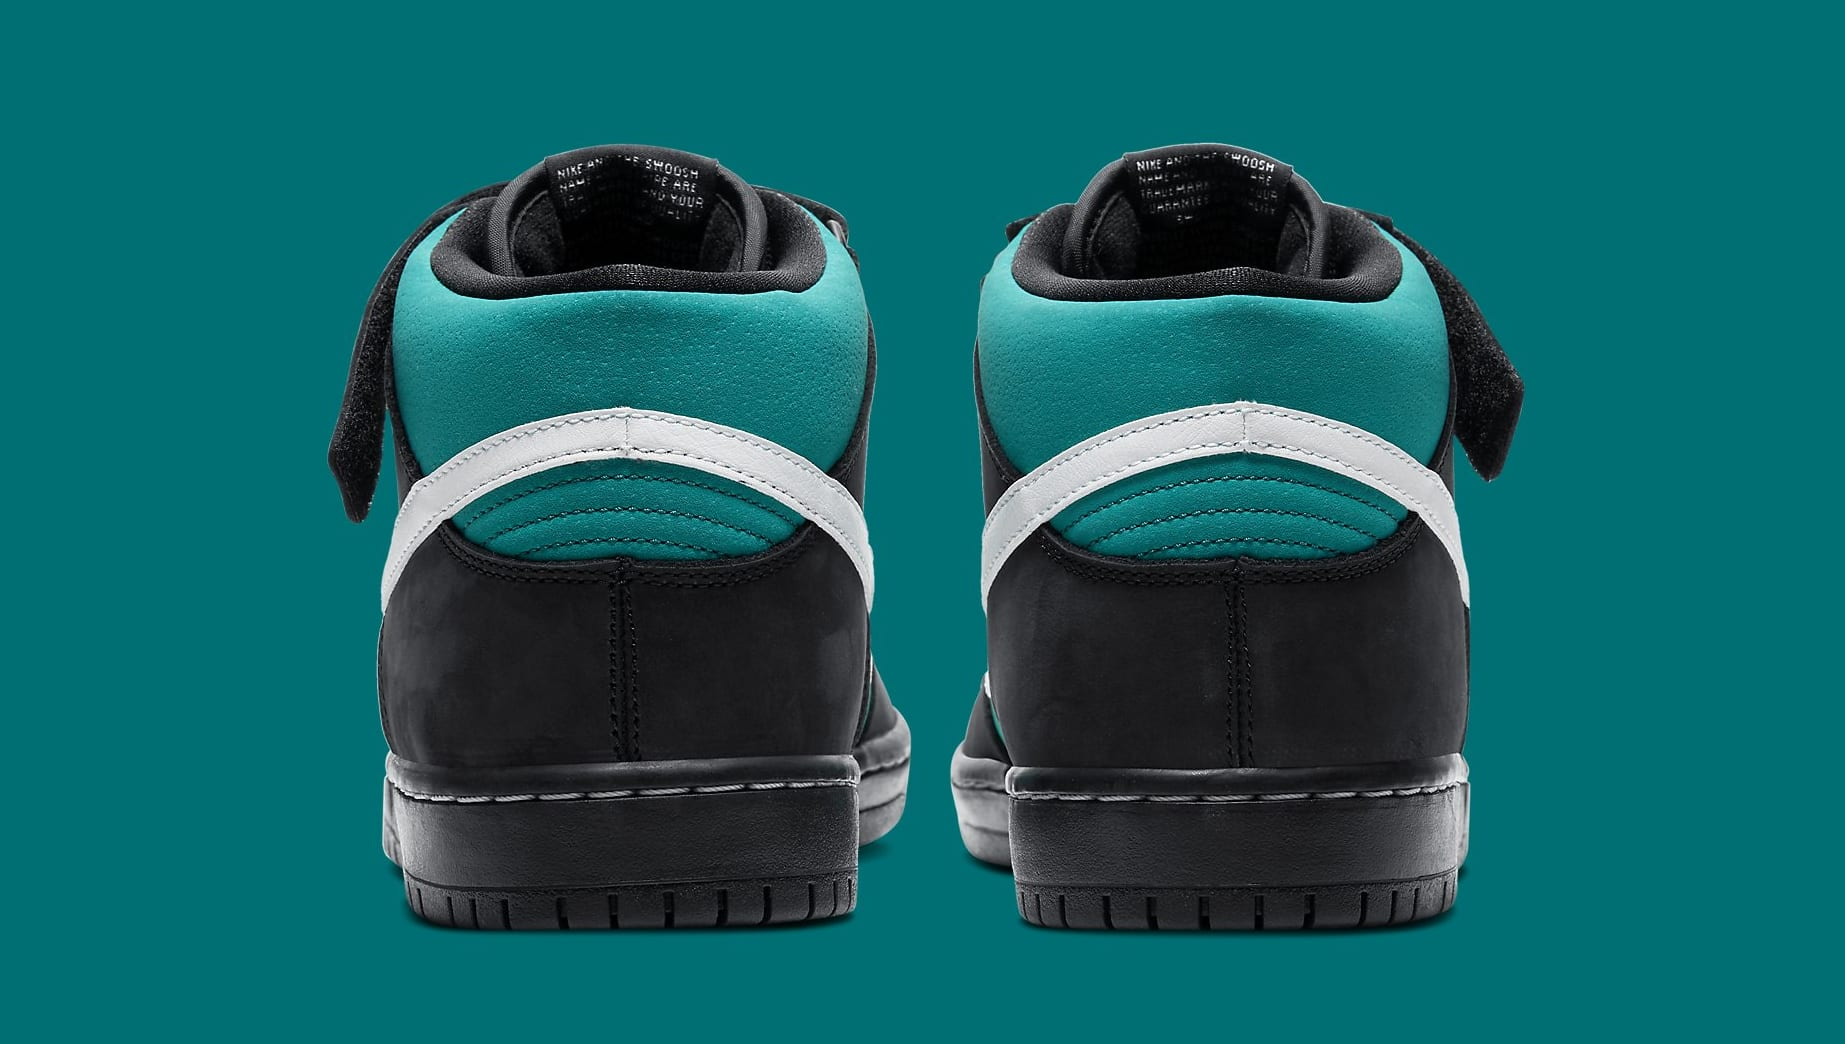 Nike SB Dunk Mid 'Griffey Jr.' CV5474-001 Heel